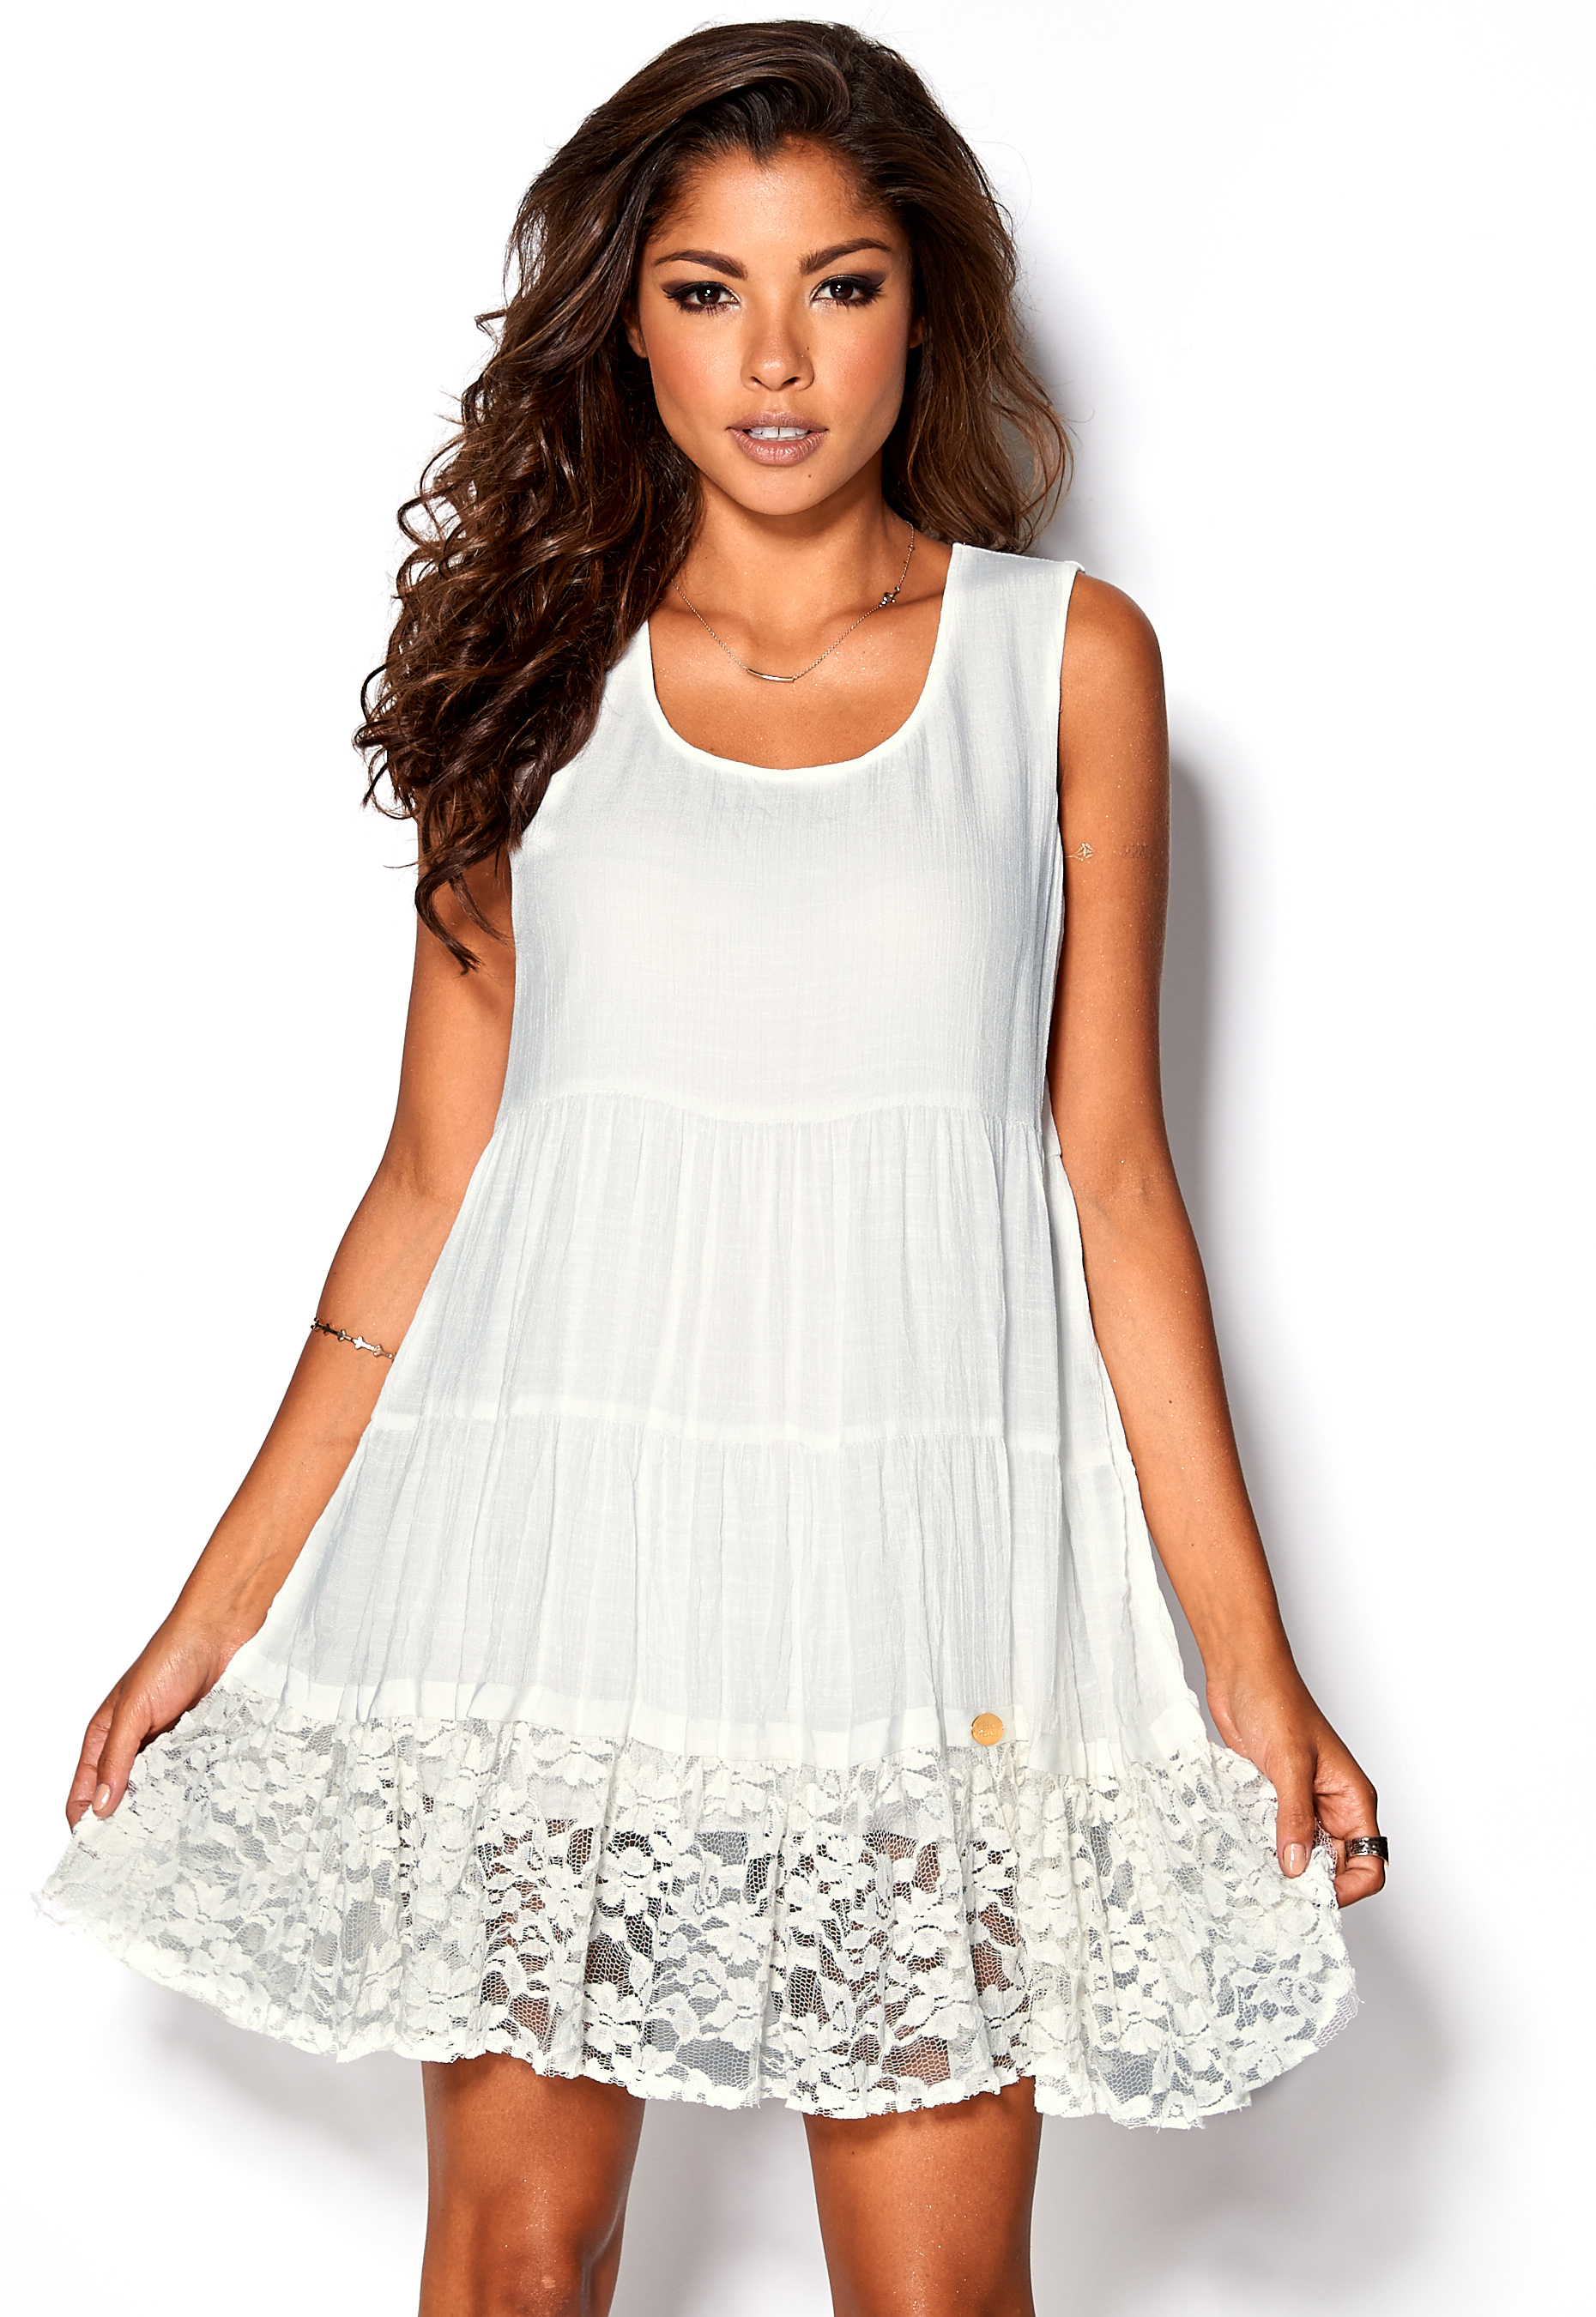 grossistförsäljning beställa online bra kvalitet Chiara Forthi Anou Dress Cream - Bubbleroom